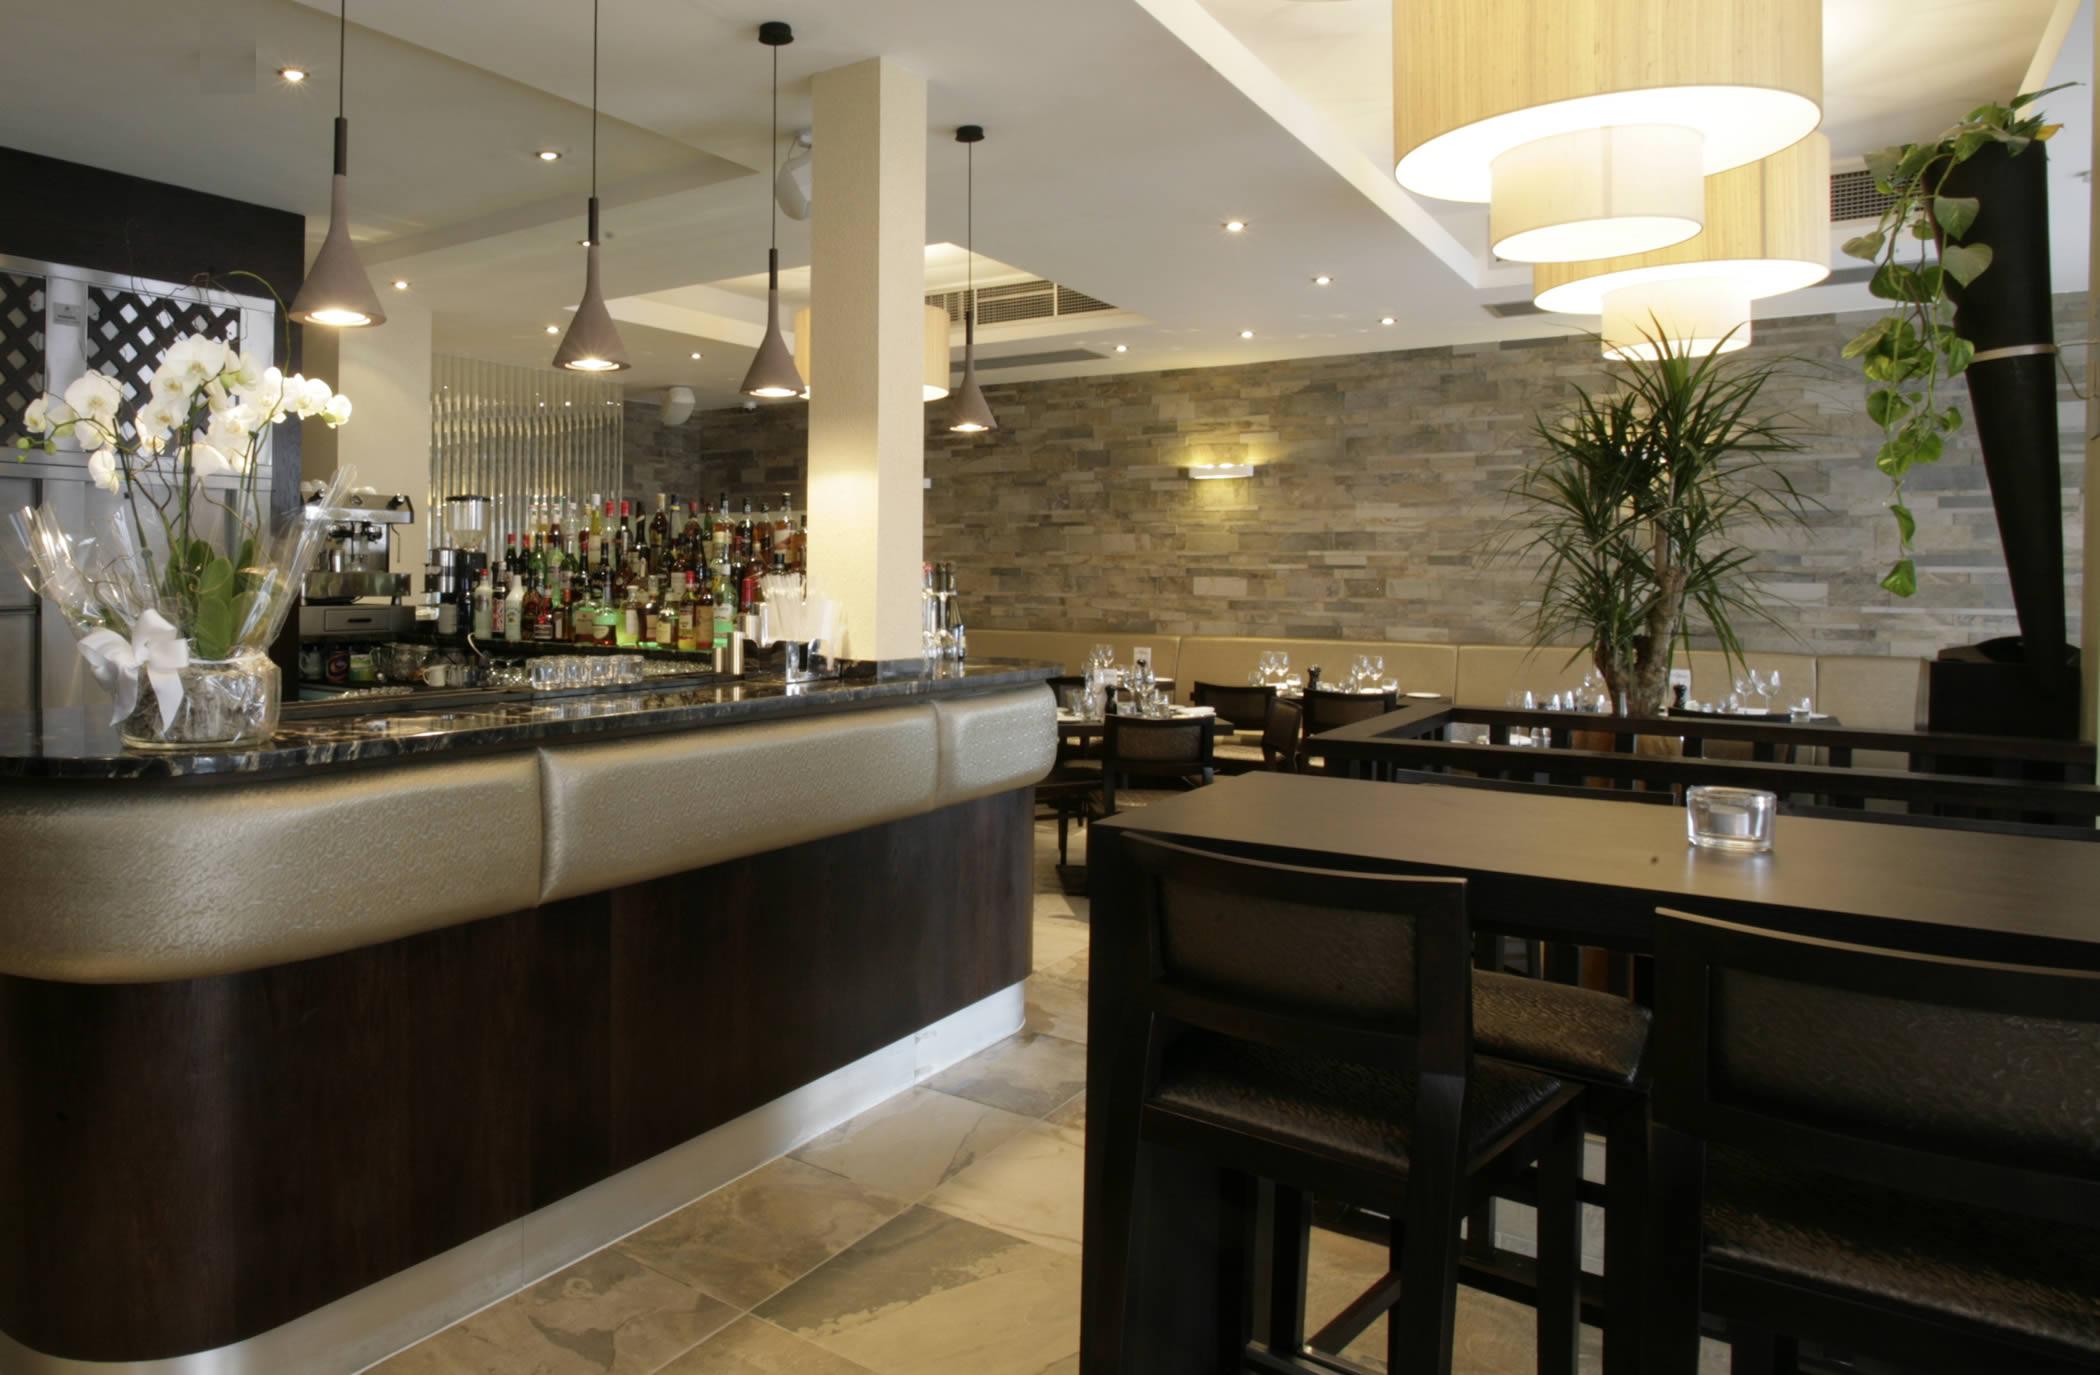 Aqua Mediterranean Bar Grill Restaurants In South London